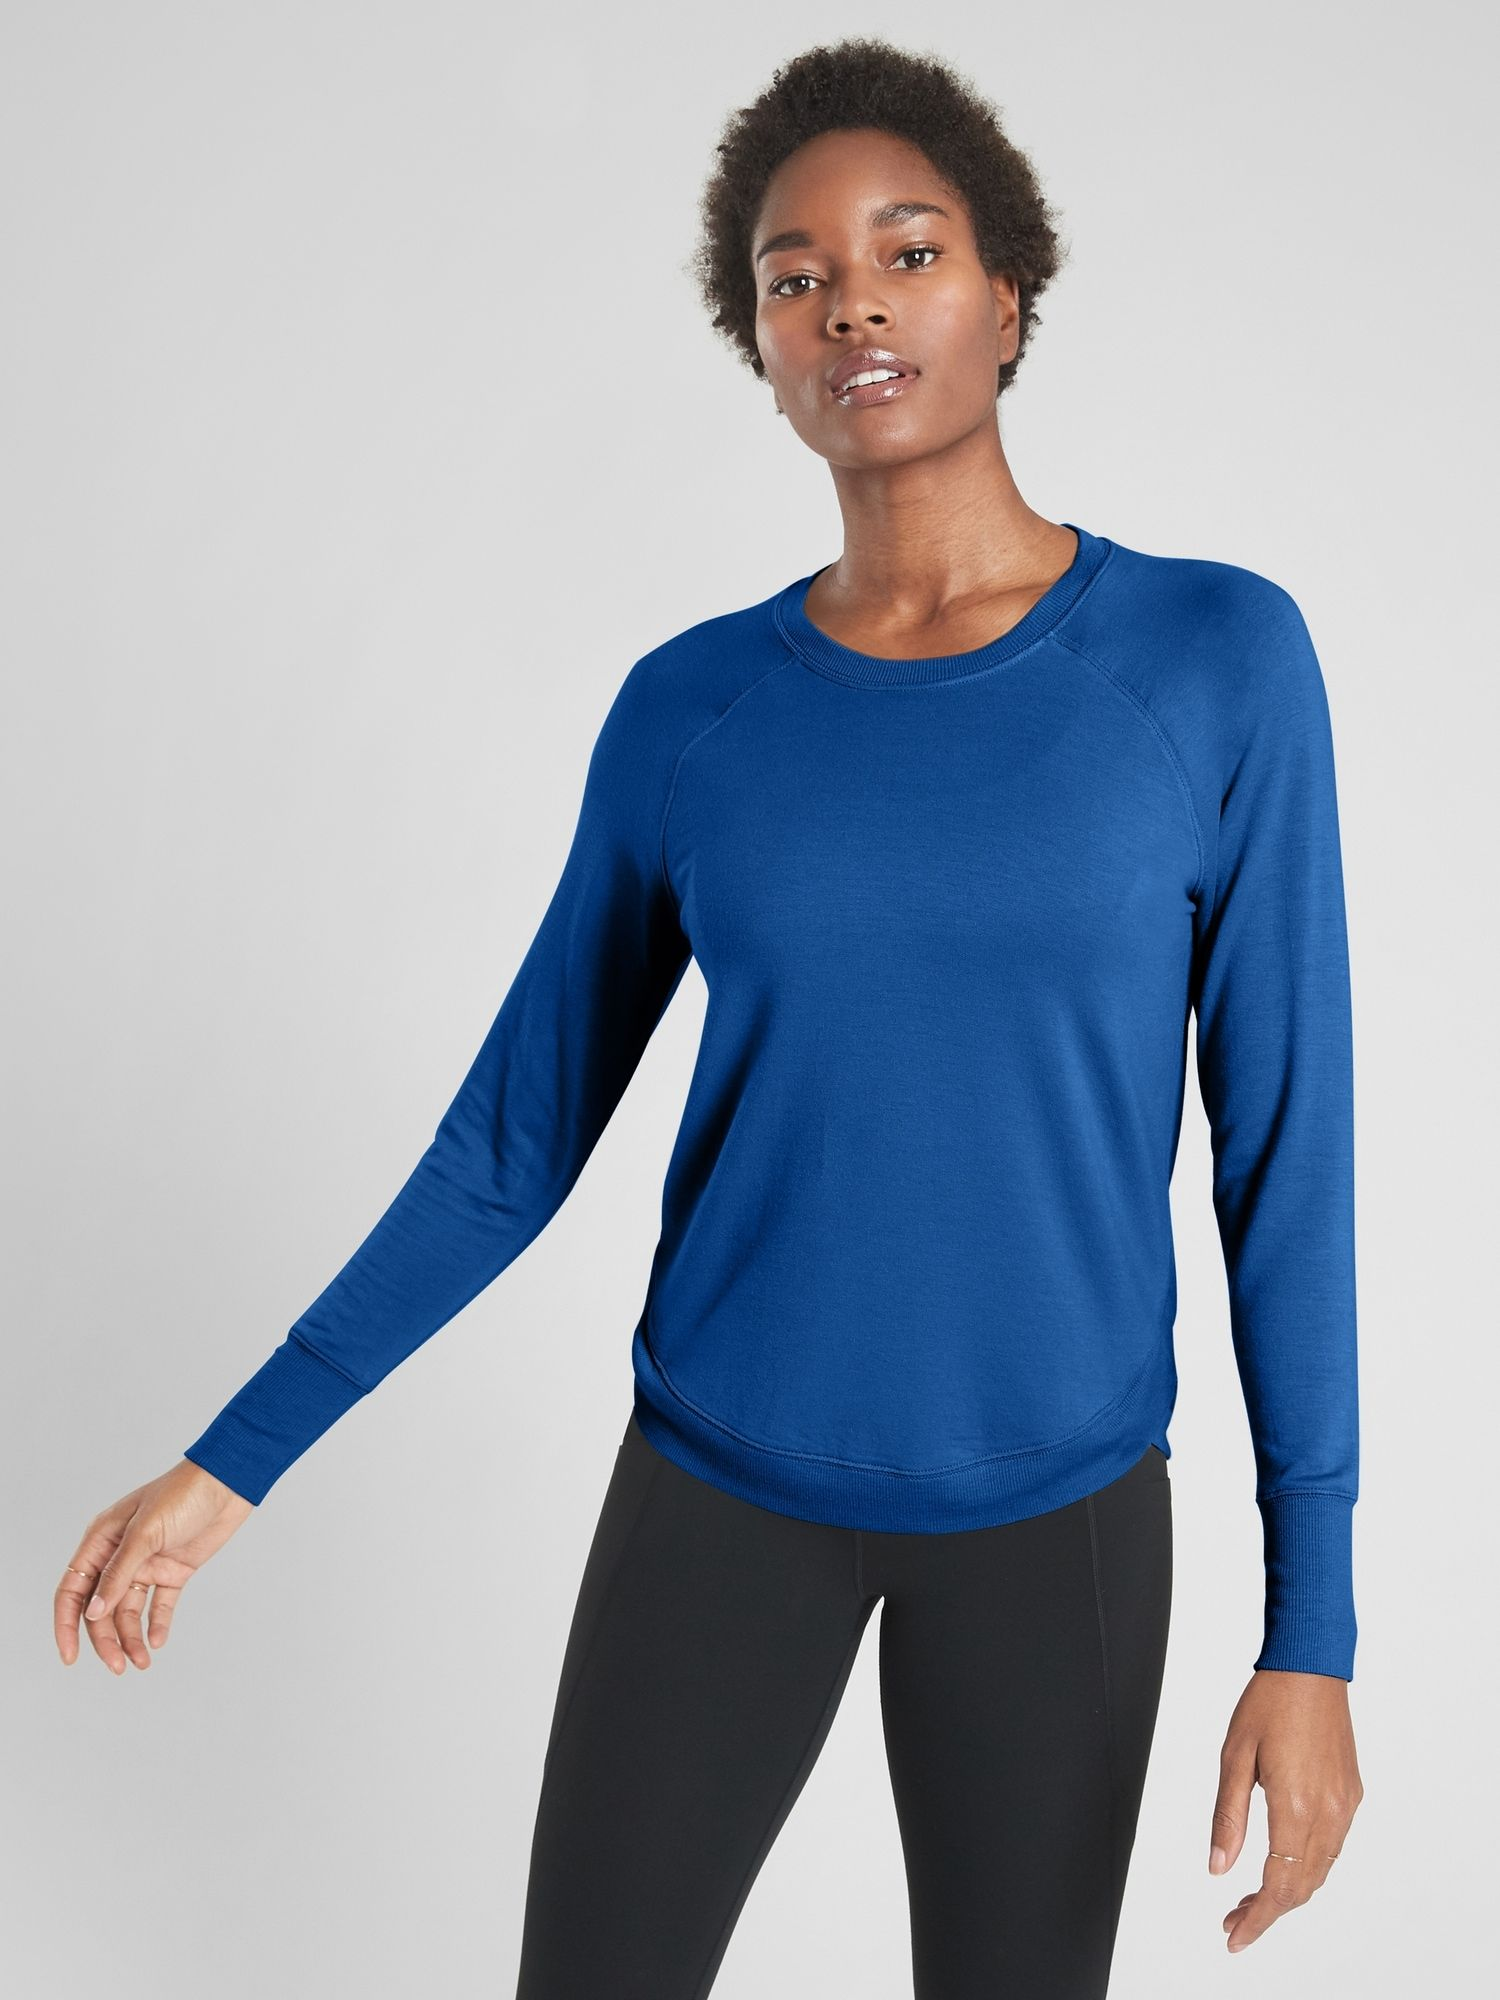 NEW Athleta Women Mindset Sweatshirt Tulip Side Hem Sky Blue Workout Top